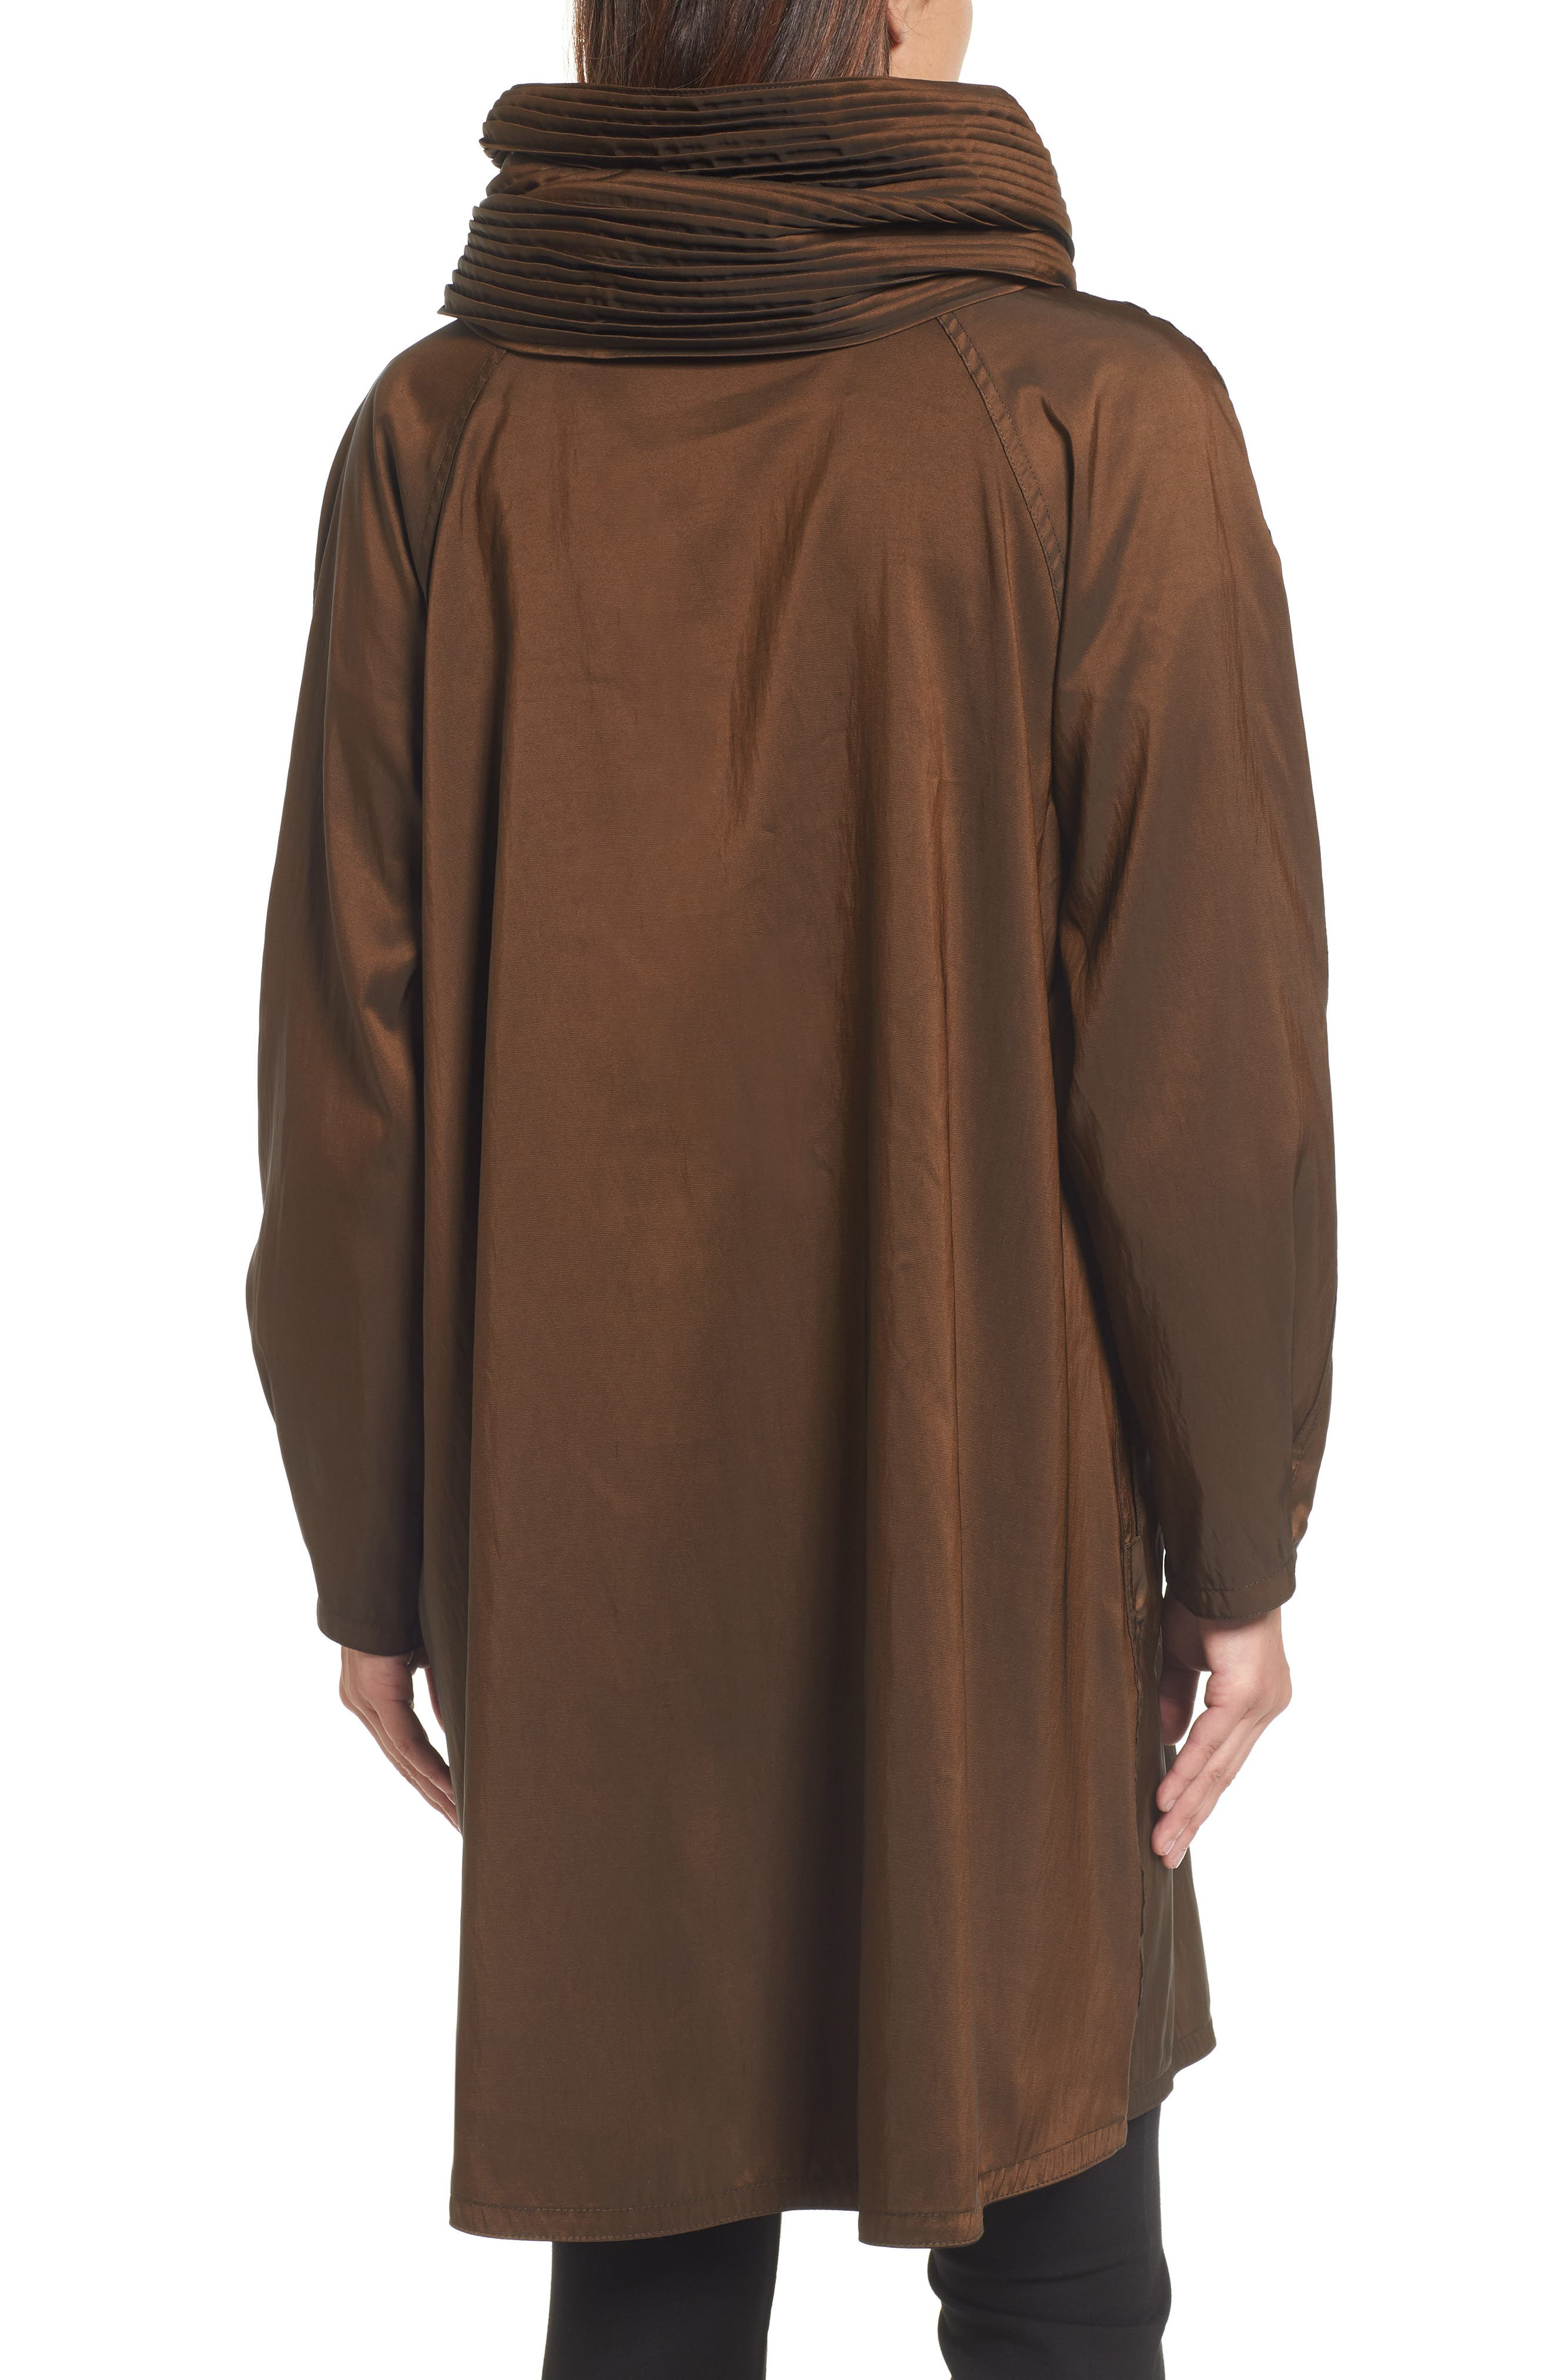 Reversible Pleat Hood Packable Travel Coat,                             Alternate thumbnail 2, color,                             Bronze/ Black